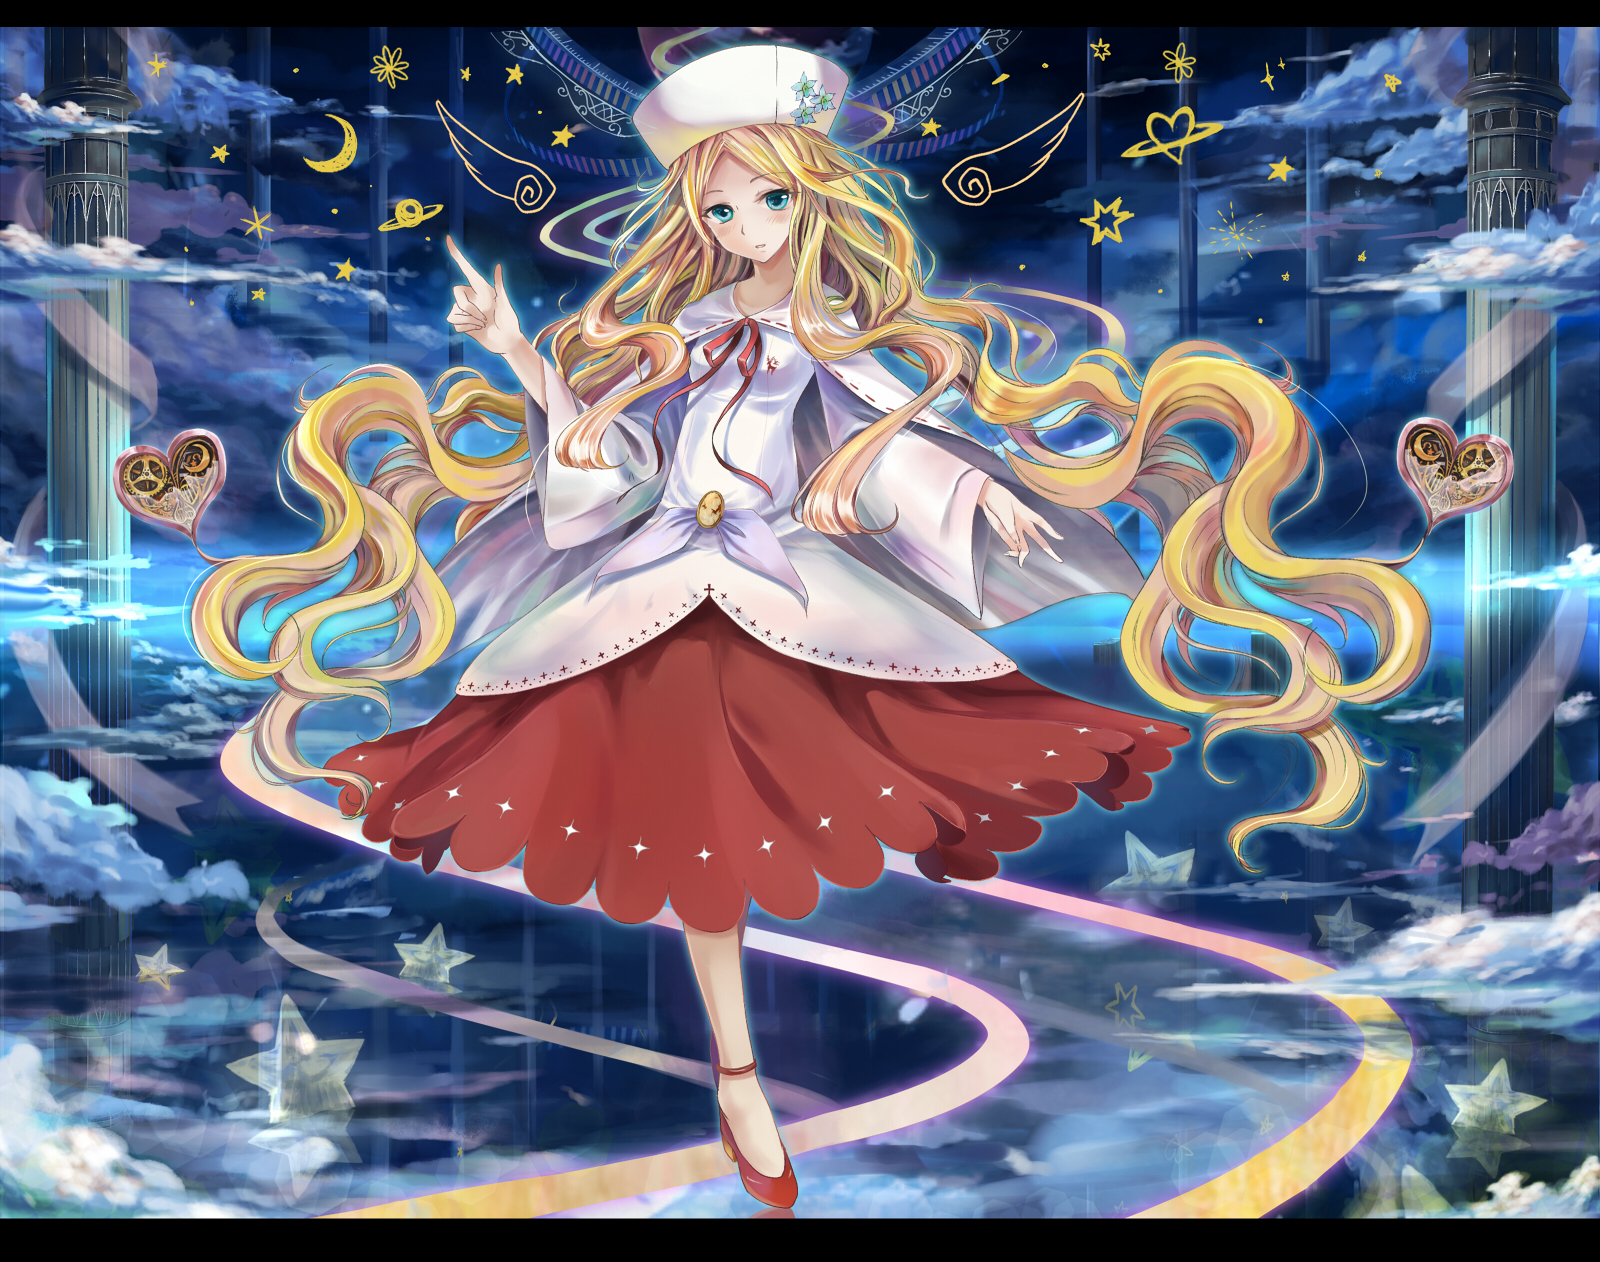 akabane_(zebrasmise) aqua_eyes blonde_hair blue_eyes blush cattleya_(pokemon) clouds dress hat long_hair night pokemon ribbons skirt stars